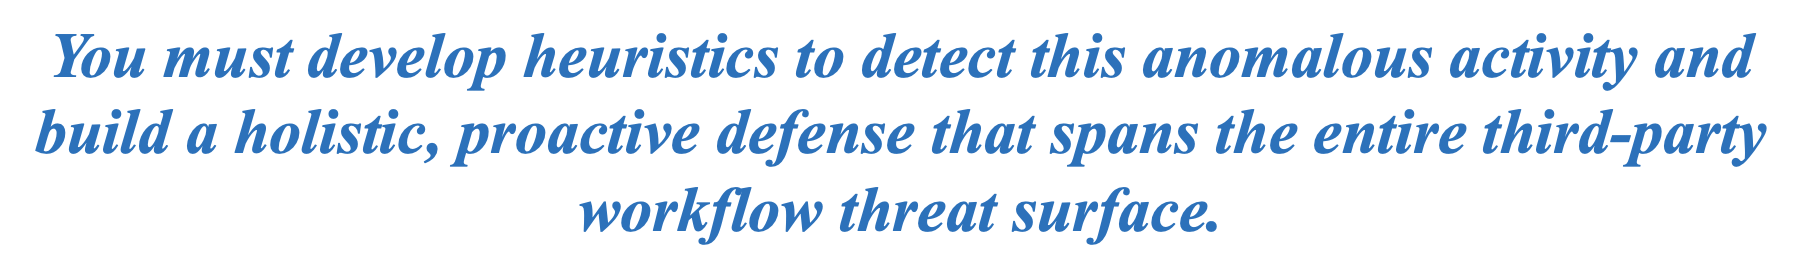 Develop heuristics to detect this anomalous activity